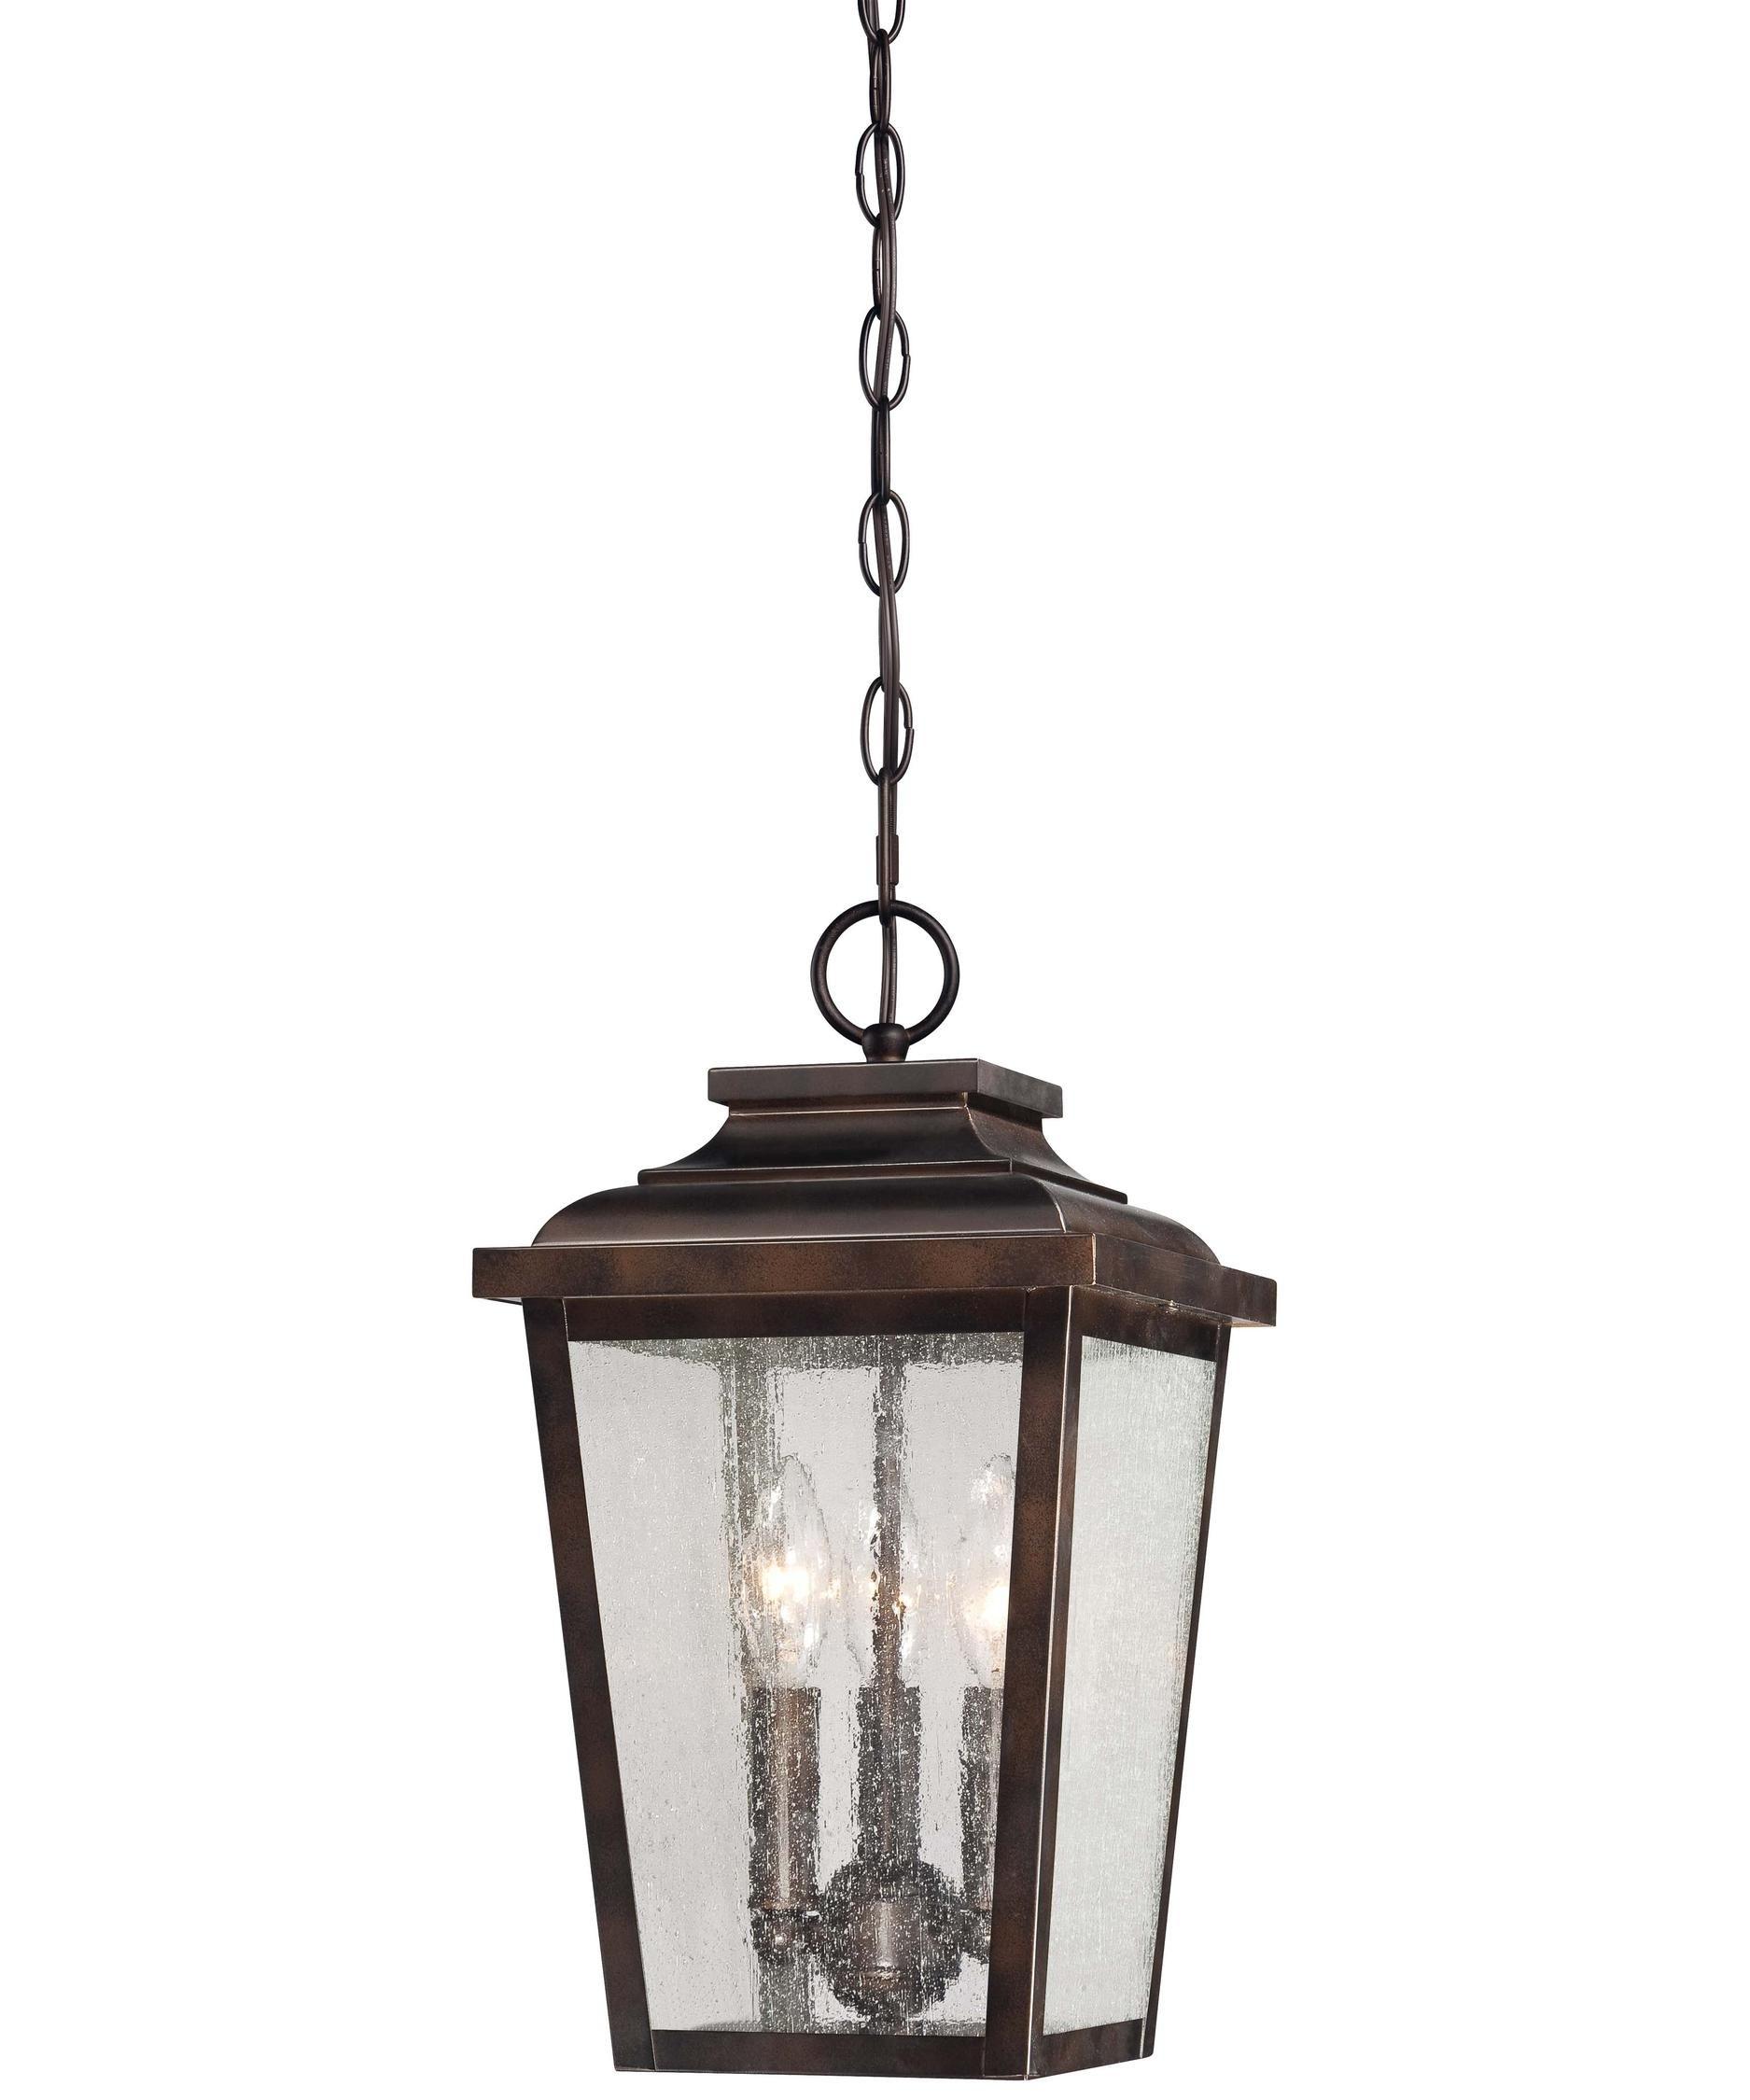 Minka Lavery 72174 Irvington Manor 3 Light Outdoor Hanging Lantern Regarding Outdoor Hanging Lights (View 4 of 15)